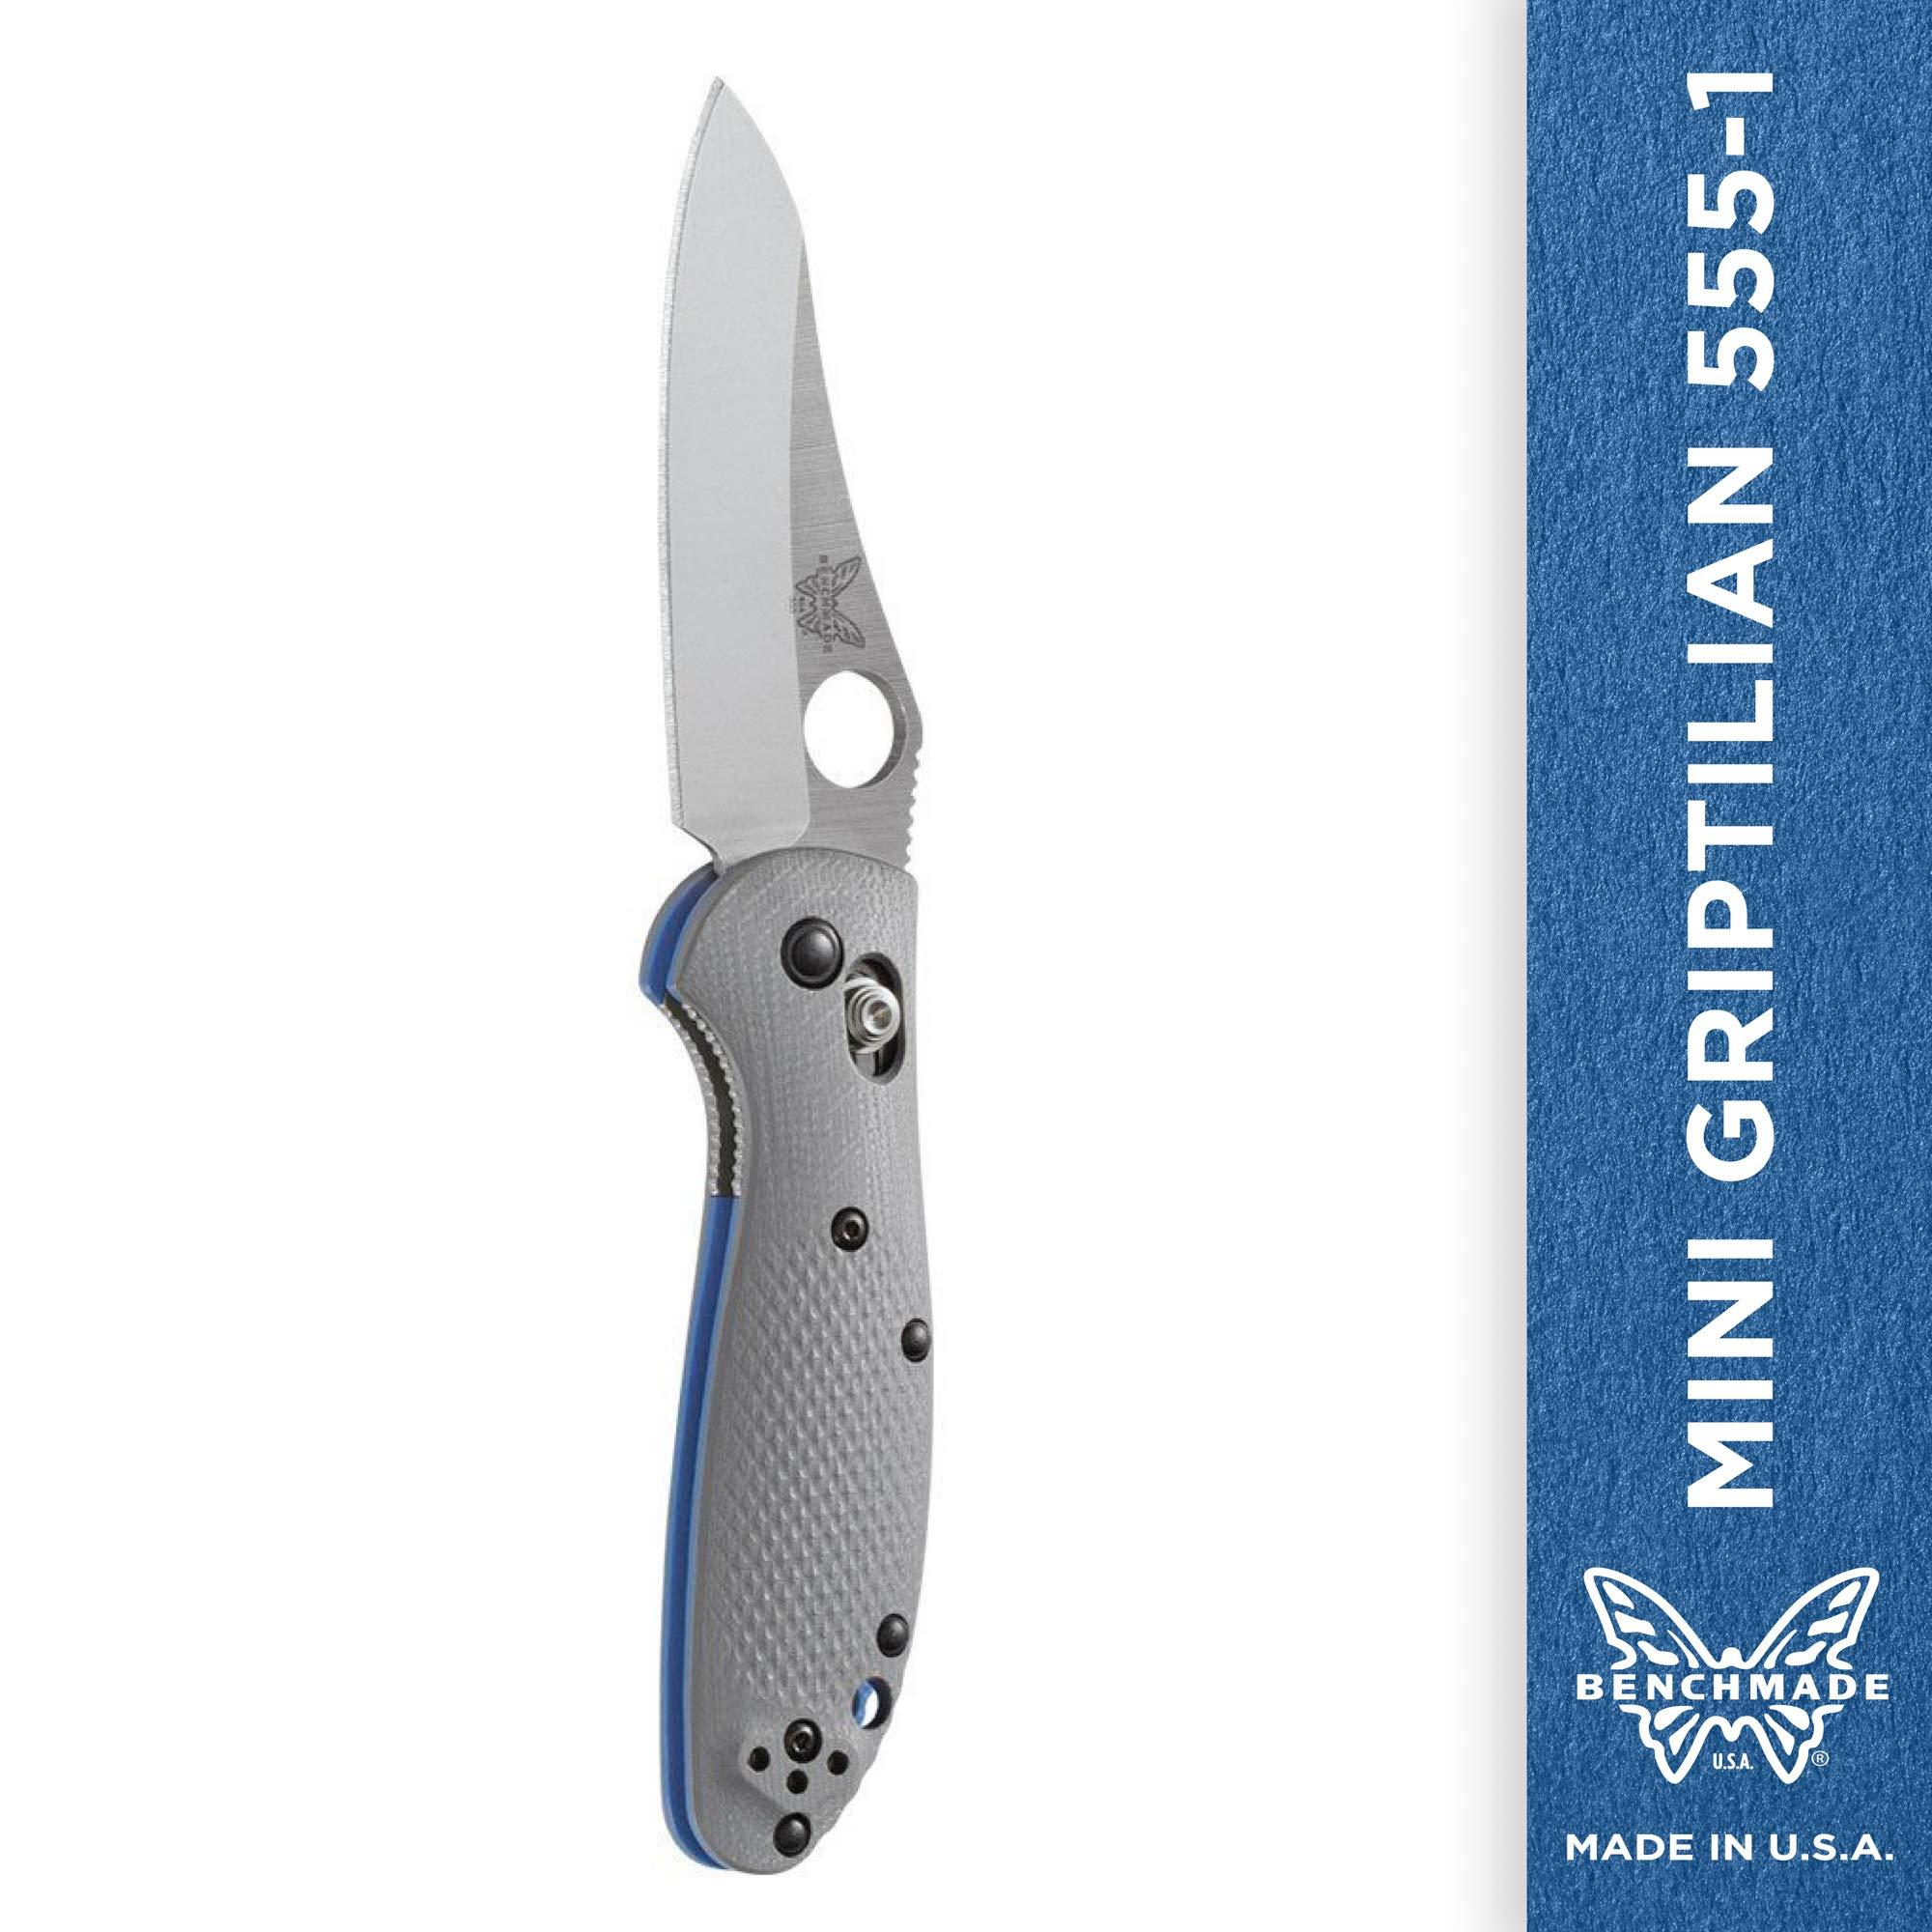 Benchmade - Mini Griptilian 555-1, Plain Sheepsfoot, Satin Finish, Gray Handle by Benchmade (Image #1)